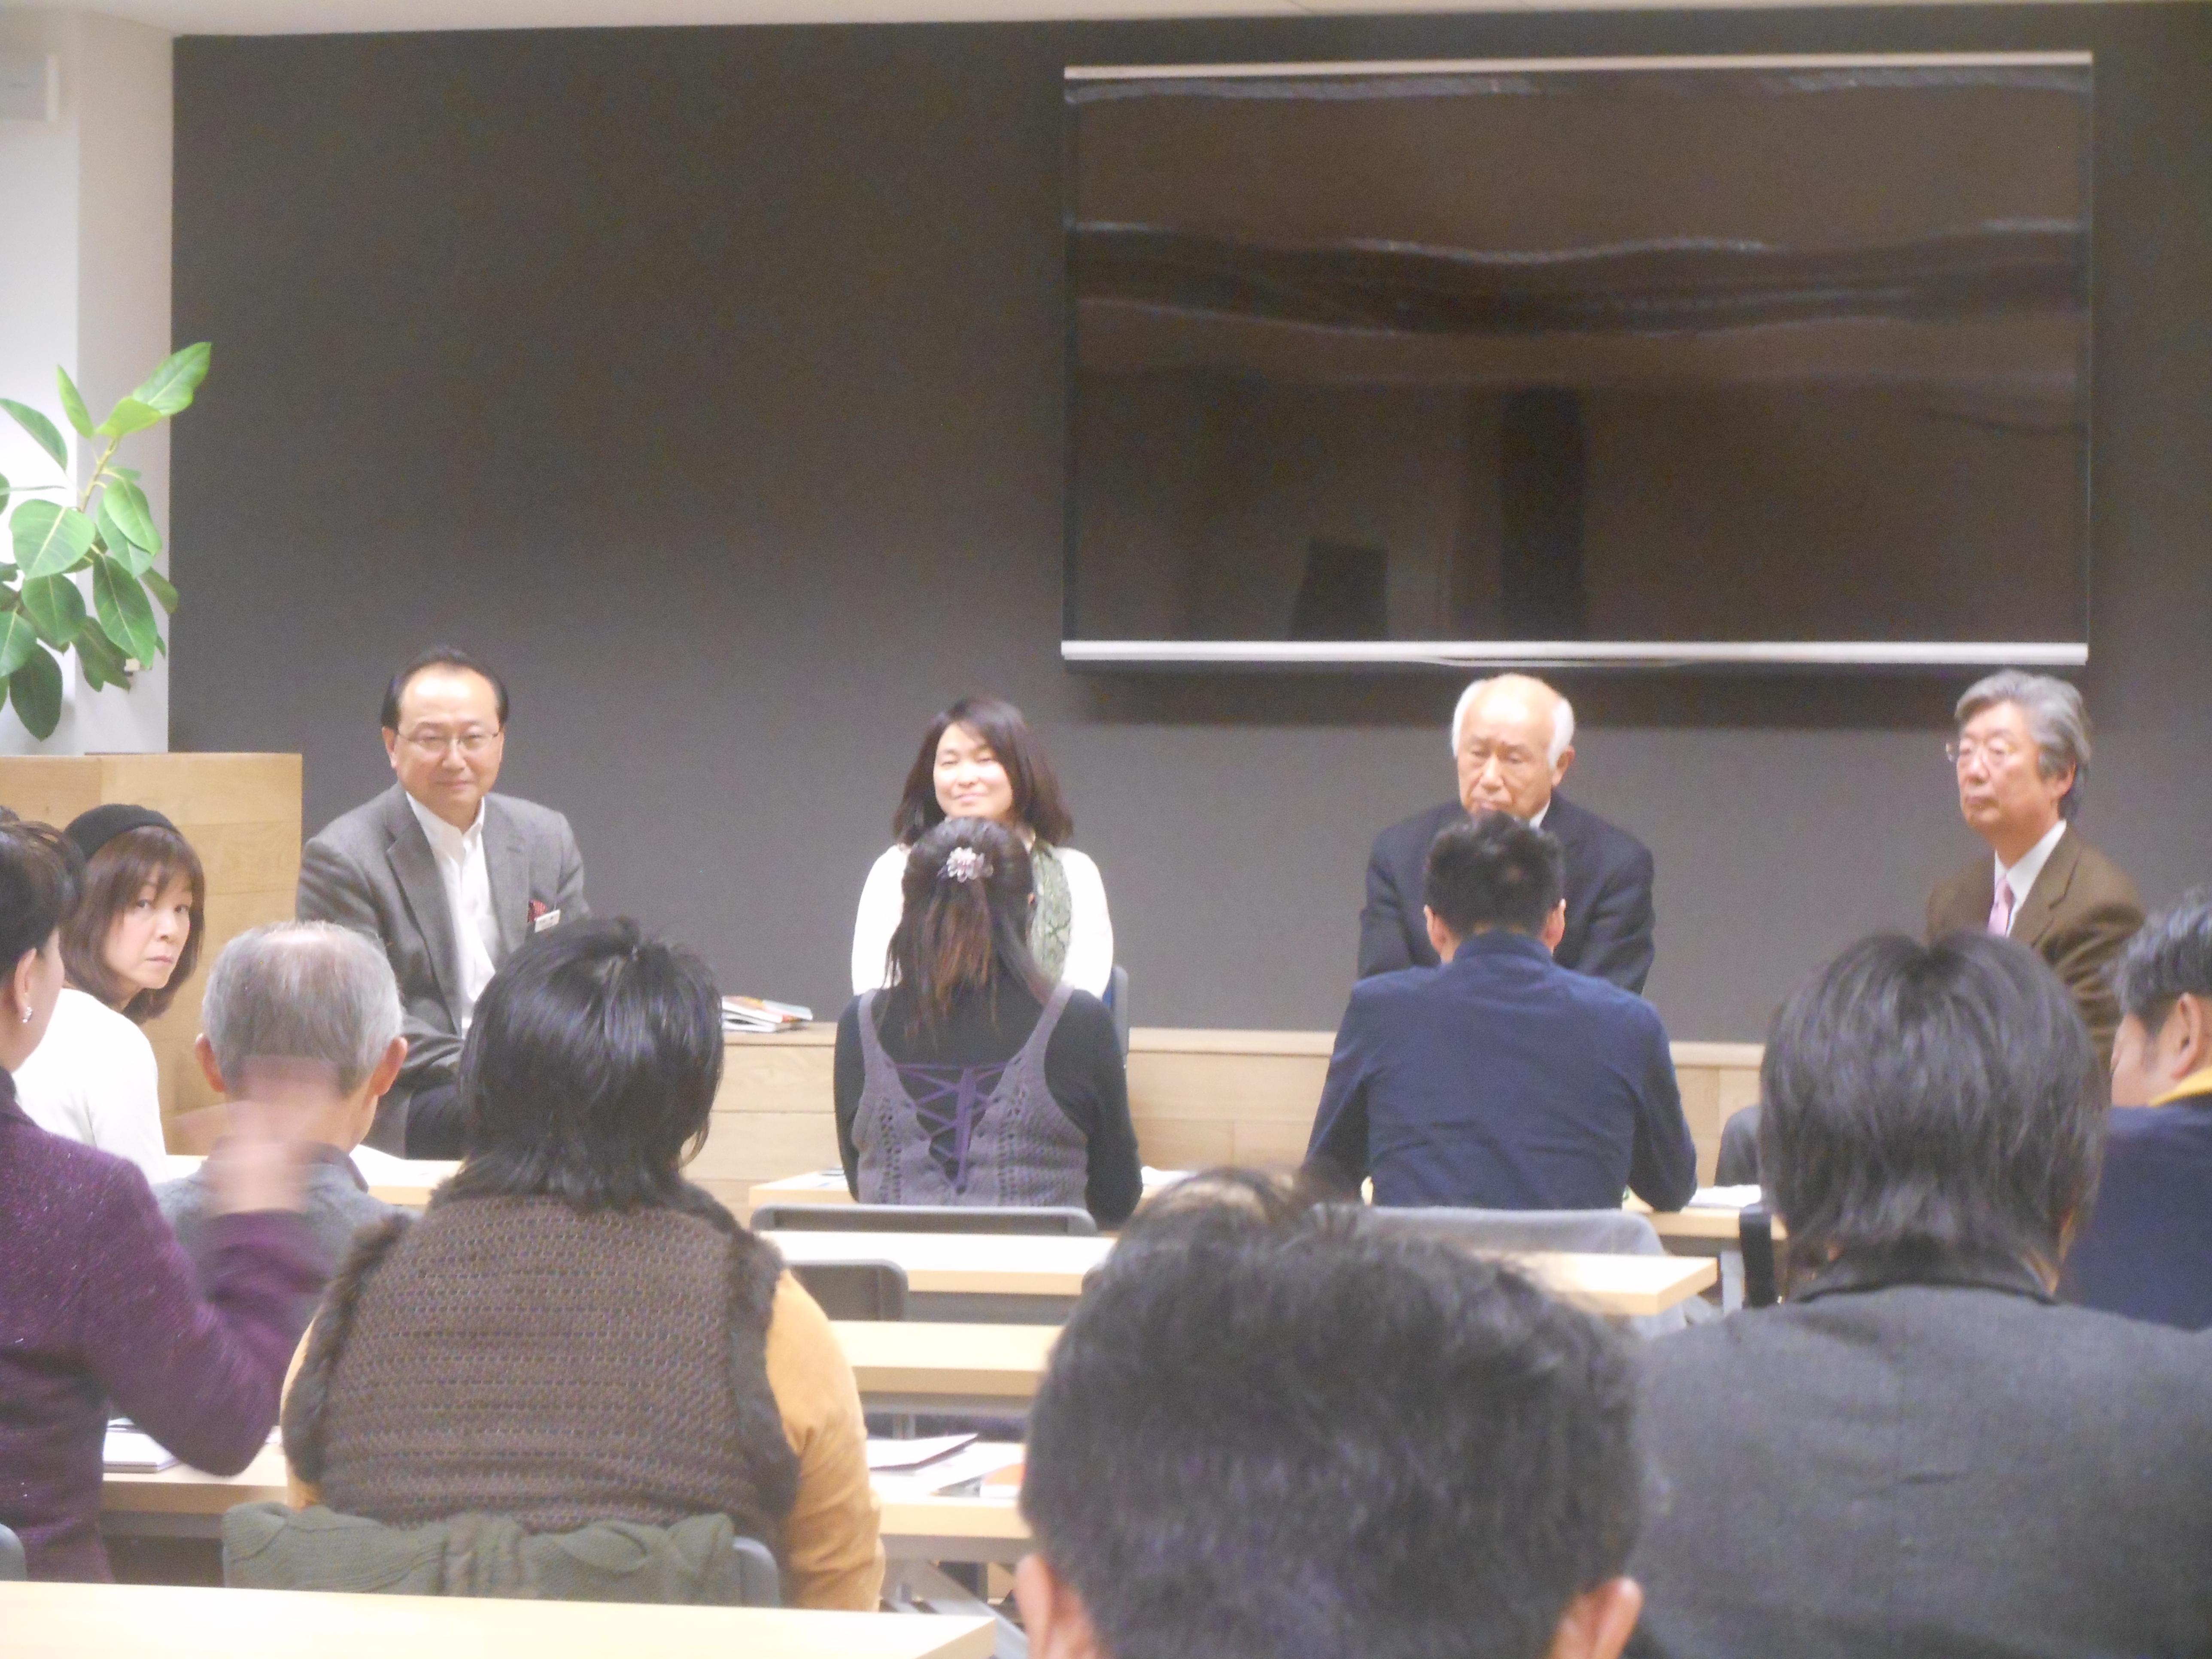 DSCN0508 - 平成30年度 東京思風塾 4月7日(土)「時代が問題をつくり、問題が人物をつくる」